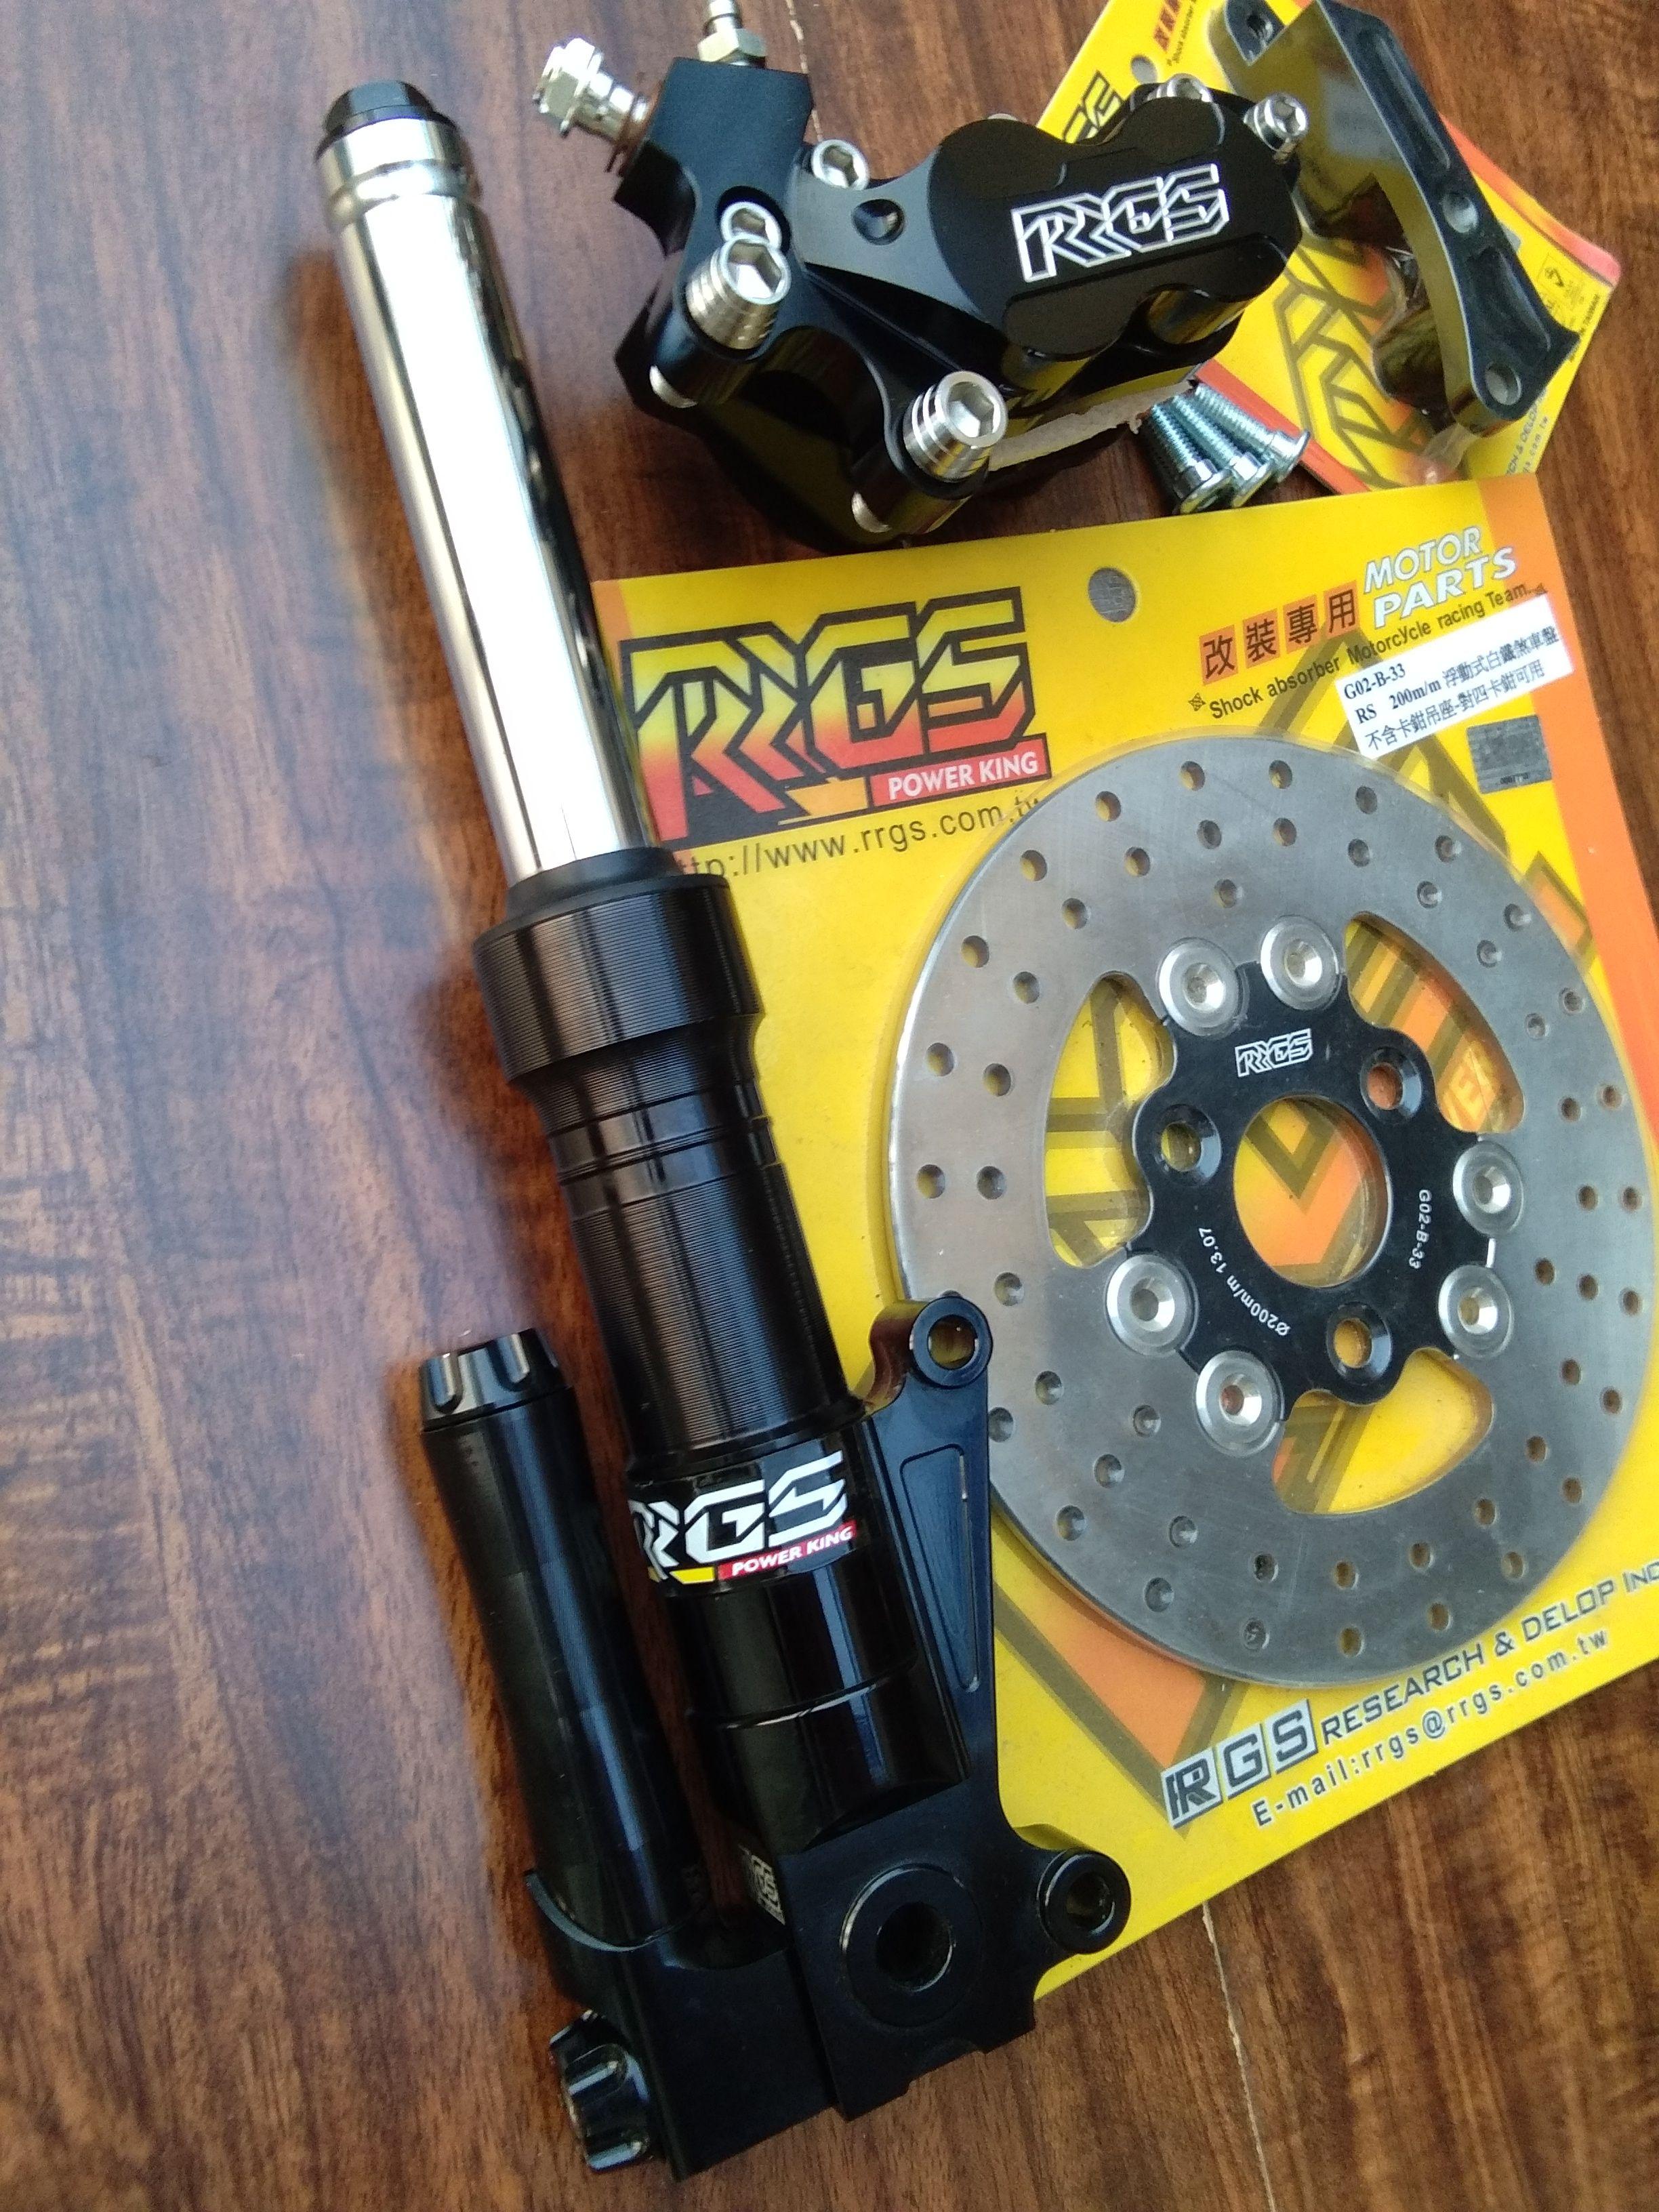 RRGS custom HONDA Ruckus front end disk brake conversion kit $599.99 ...